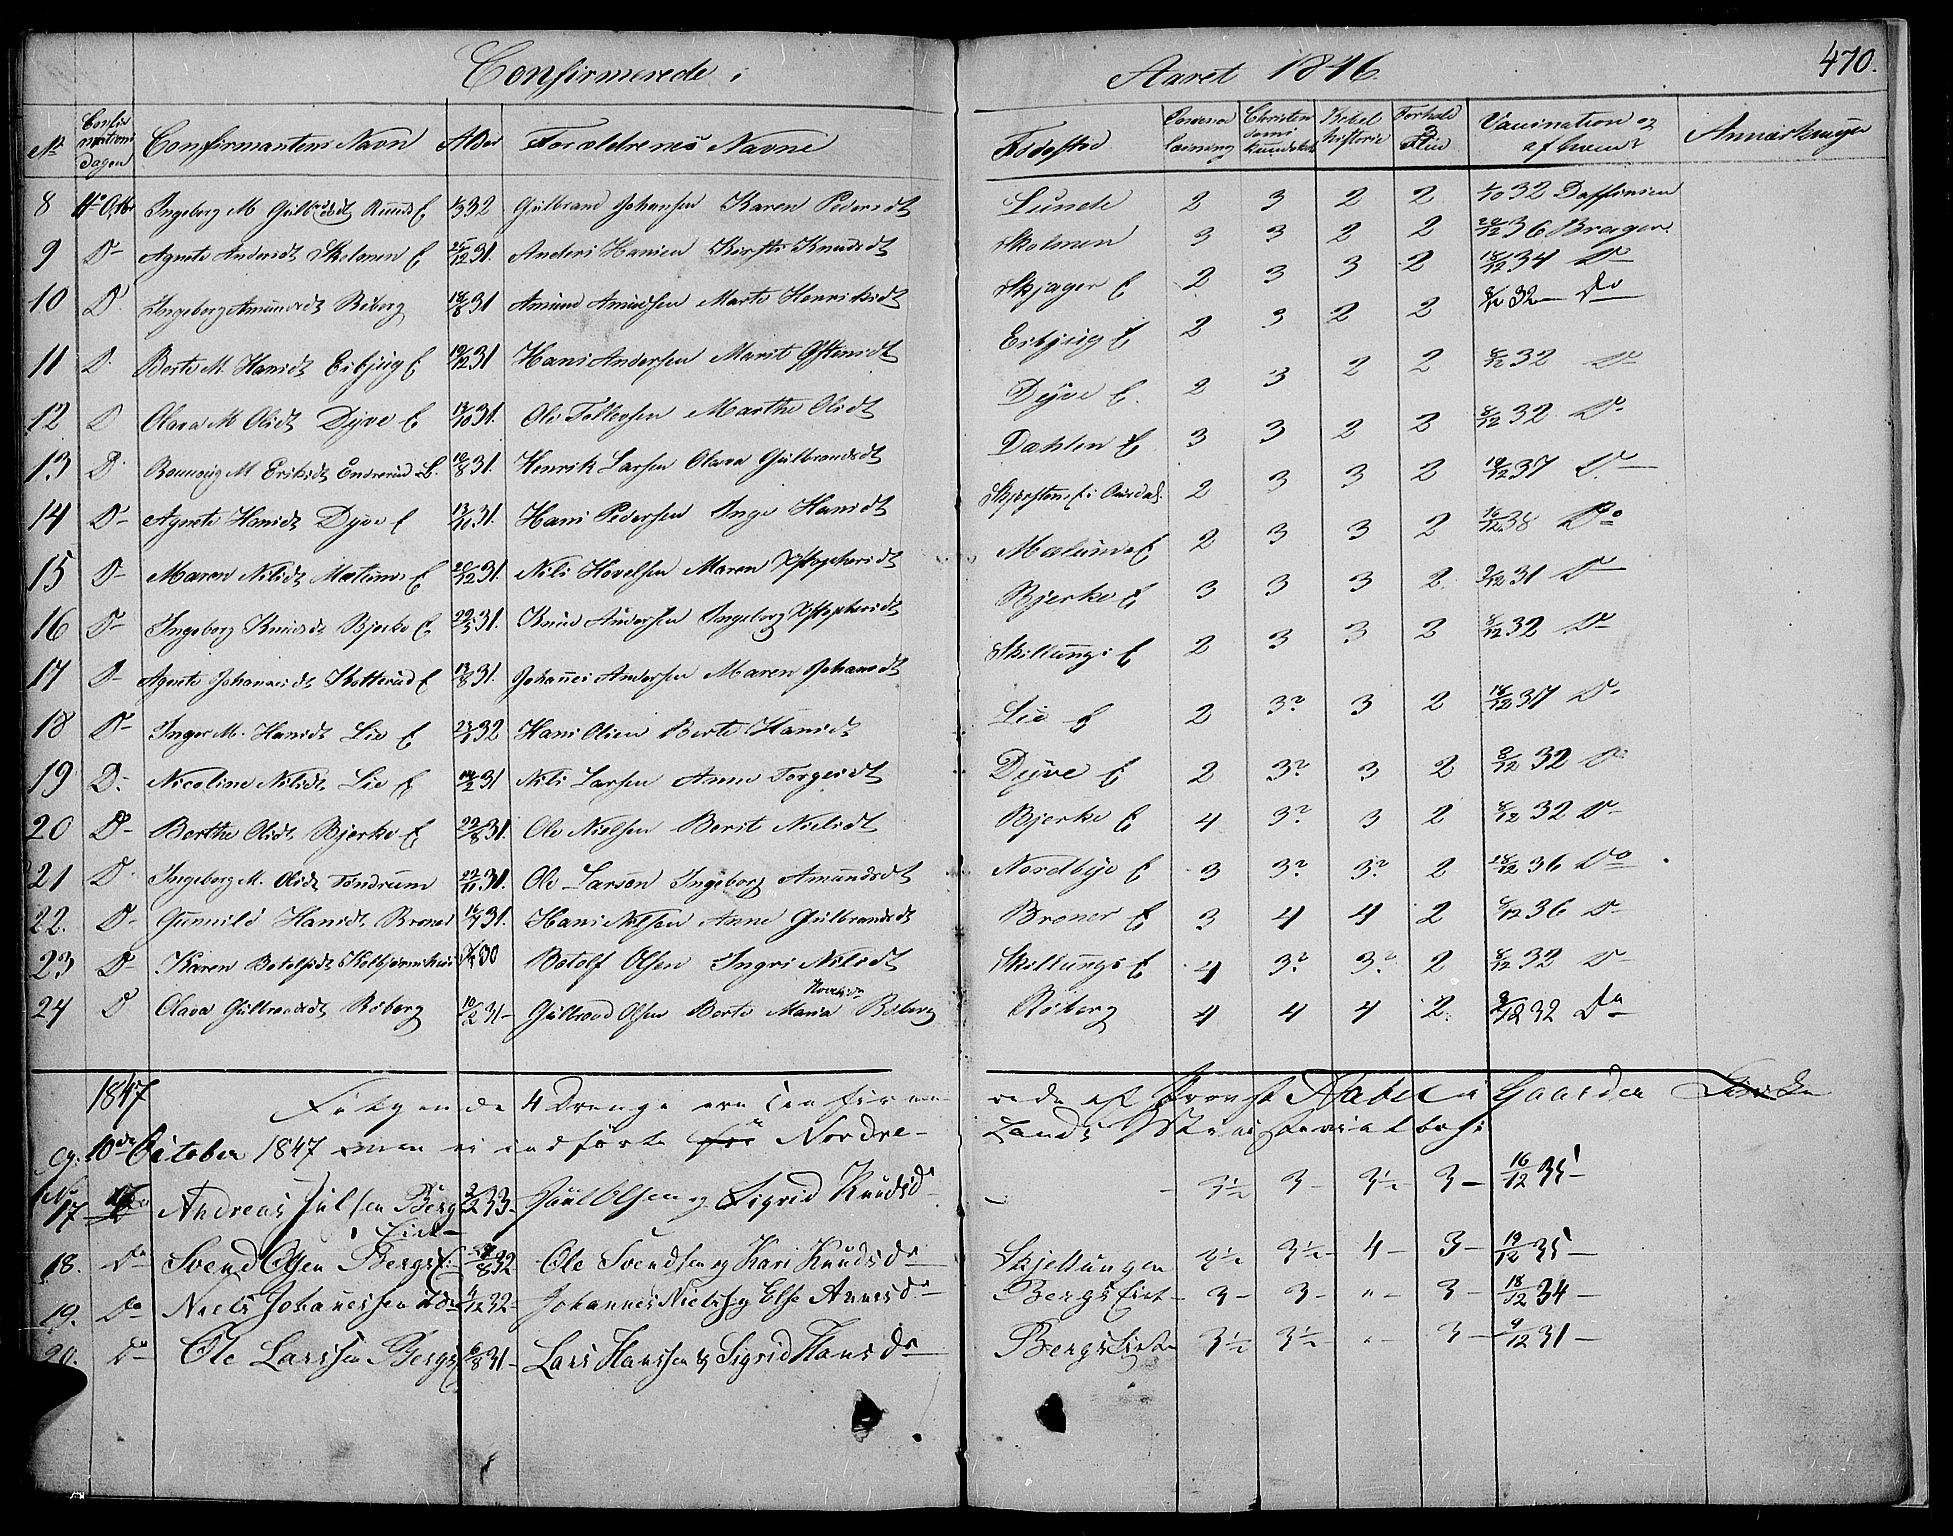 SAH, Land prestekontor, Ministerialbok nr. 8, 1830-1846, s. 470